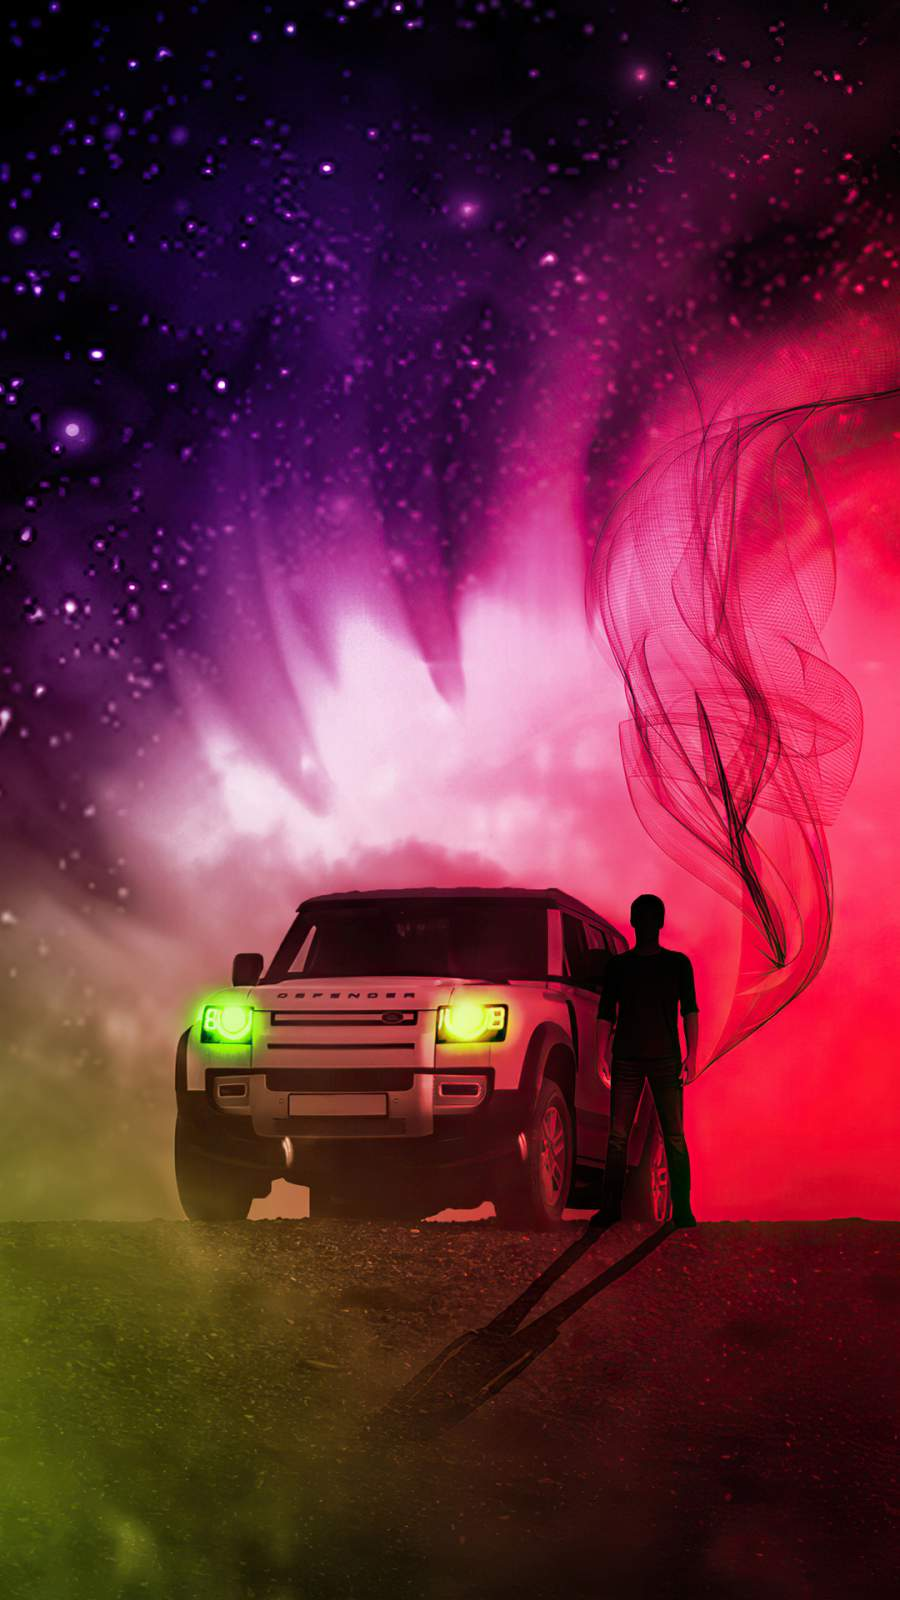 Land Rover Defender Art 4K